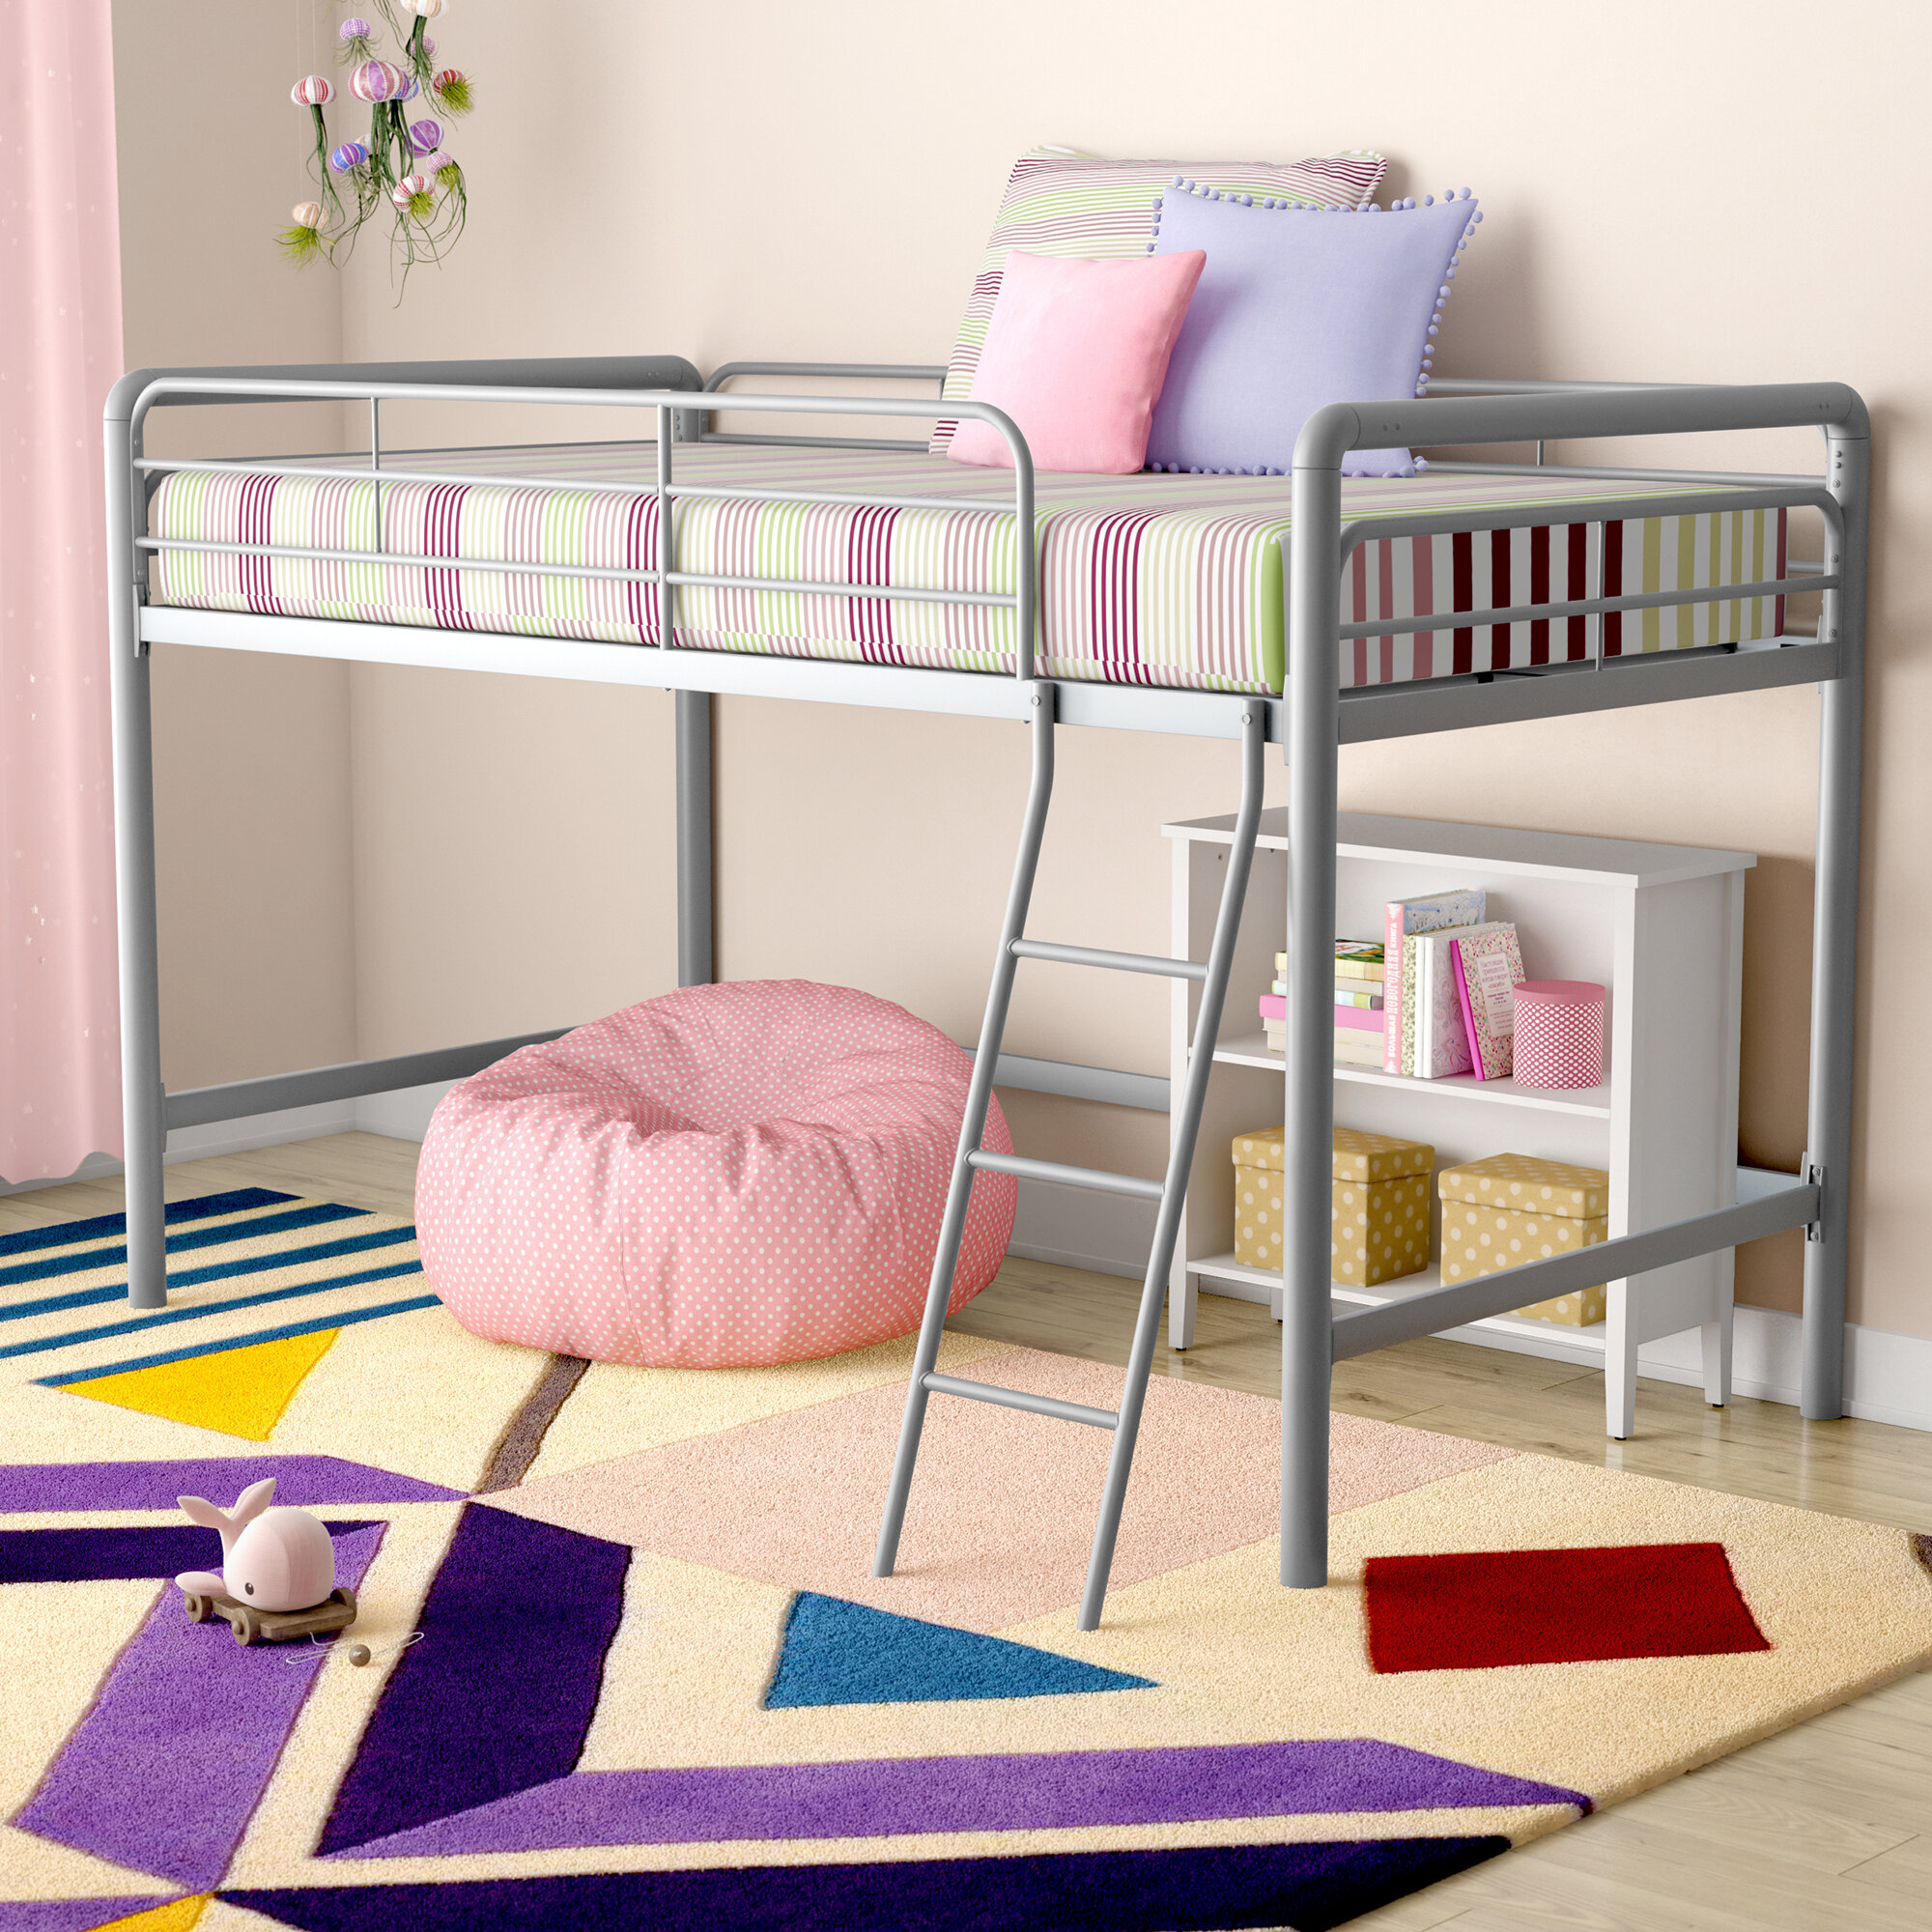 Low Loft Kids Beds You Ll Love In 2020 Wayfair